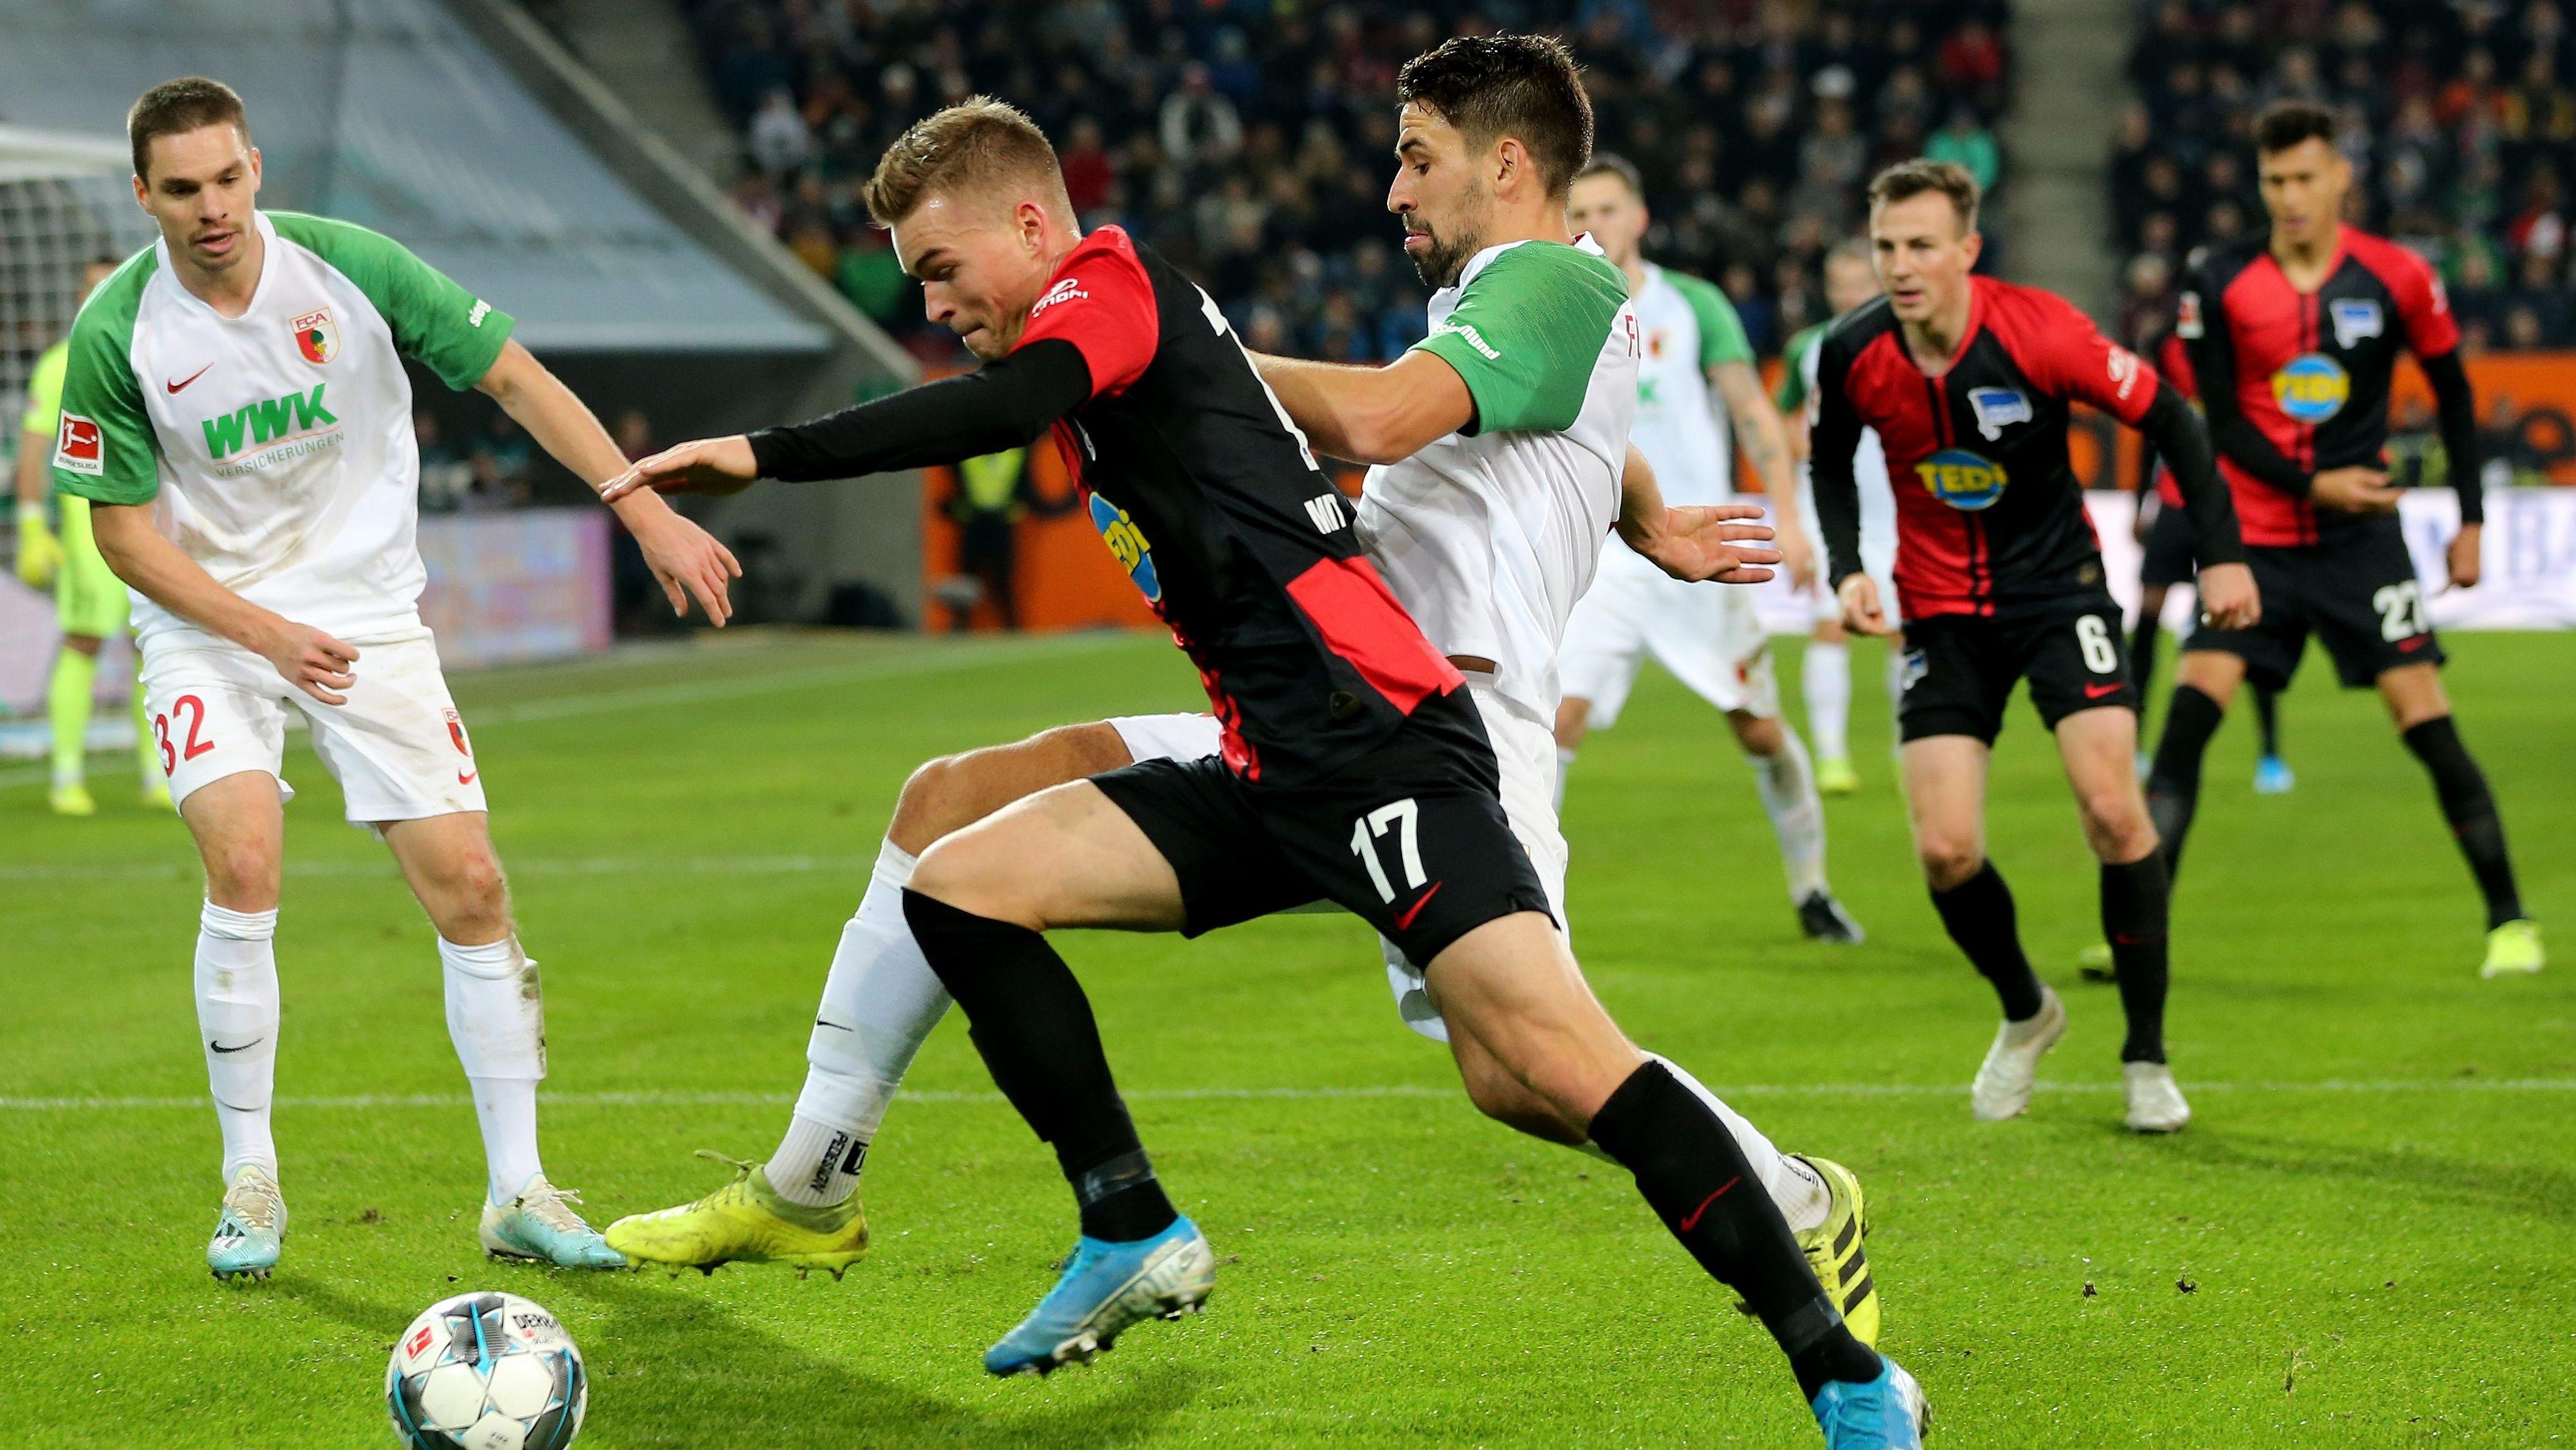 Szene aus dem Hinspiel FC Augsburg - Hertha BSC